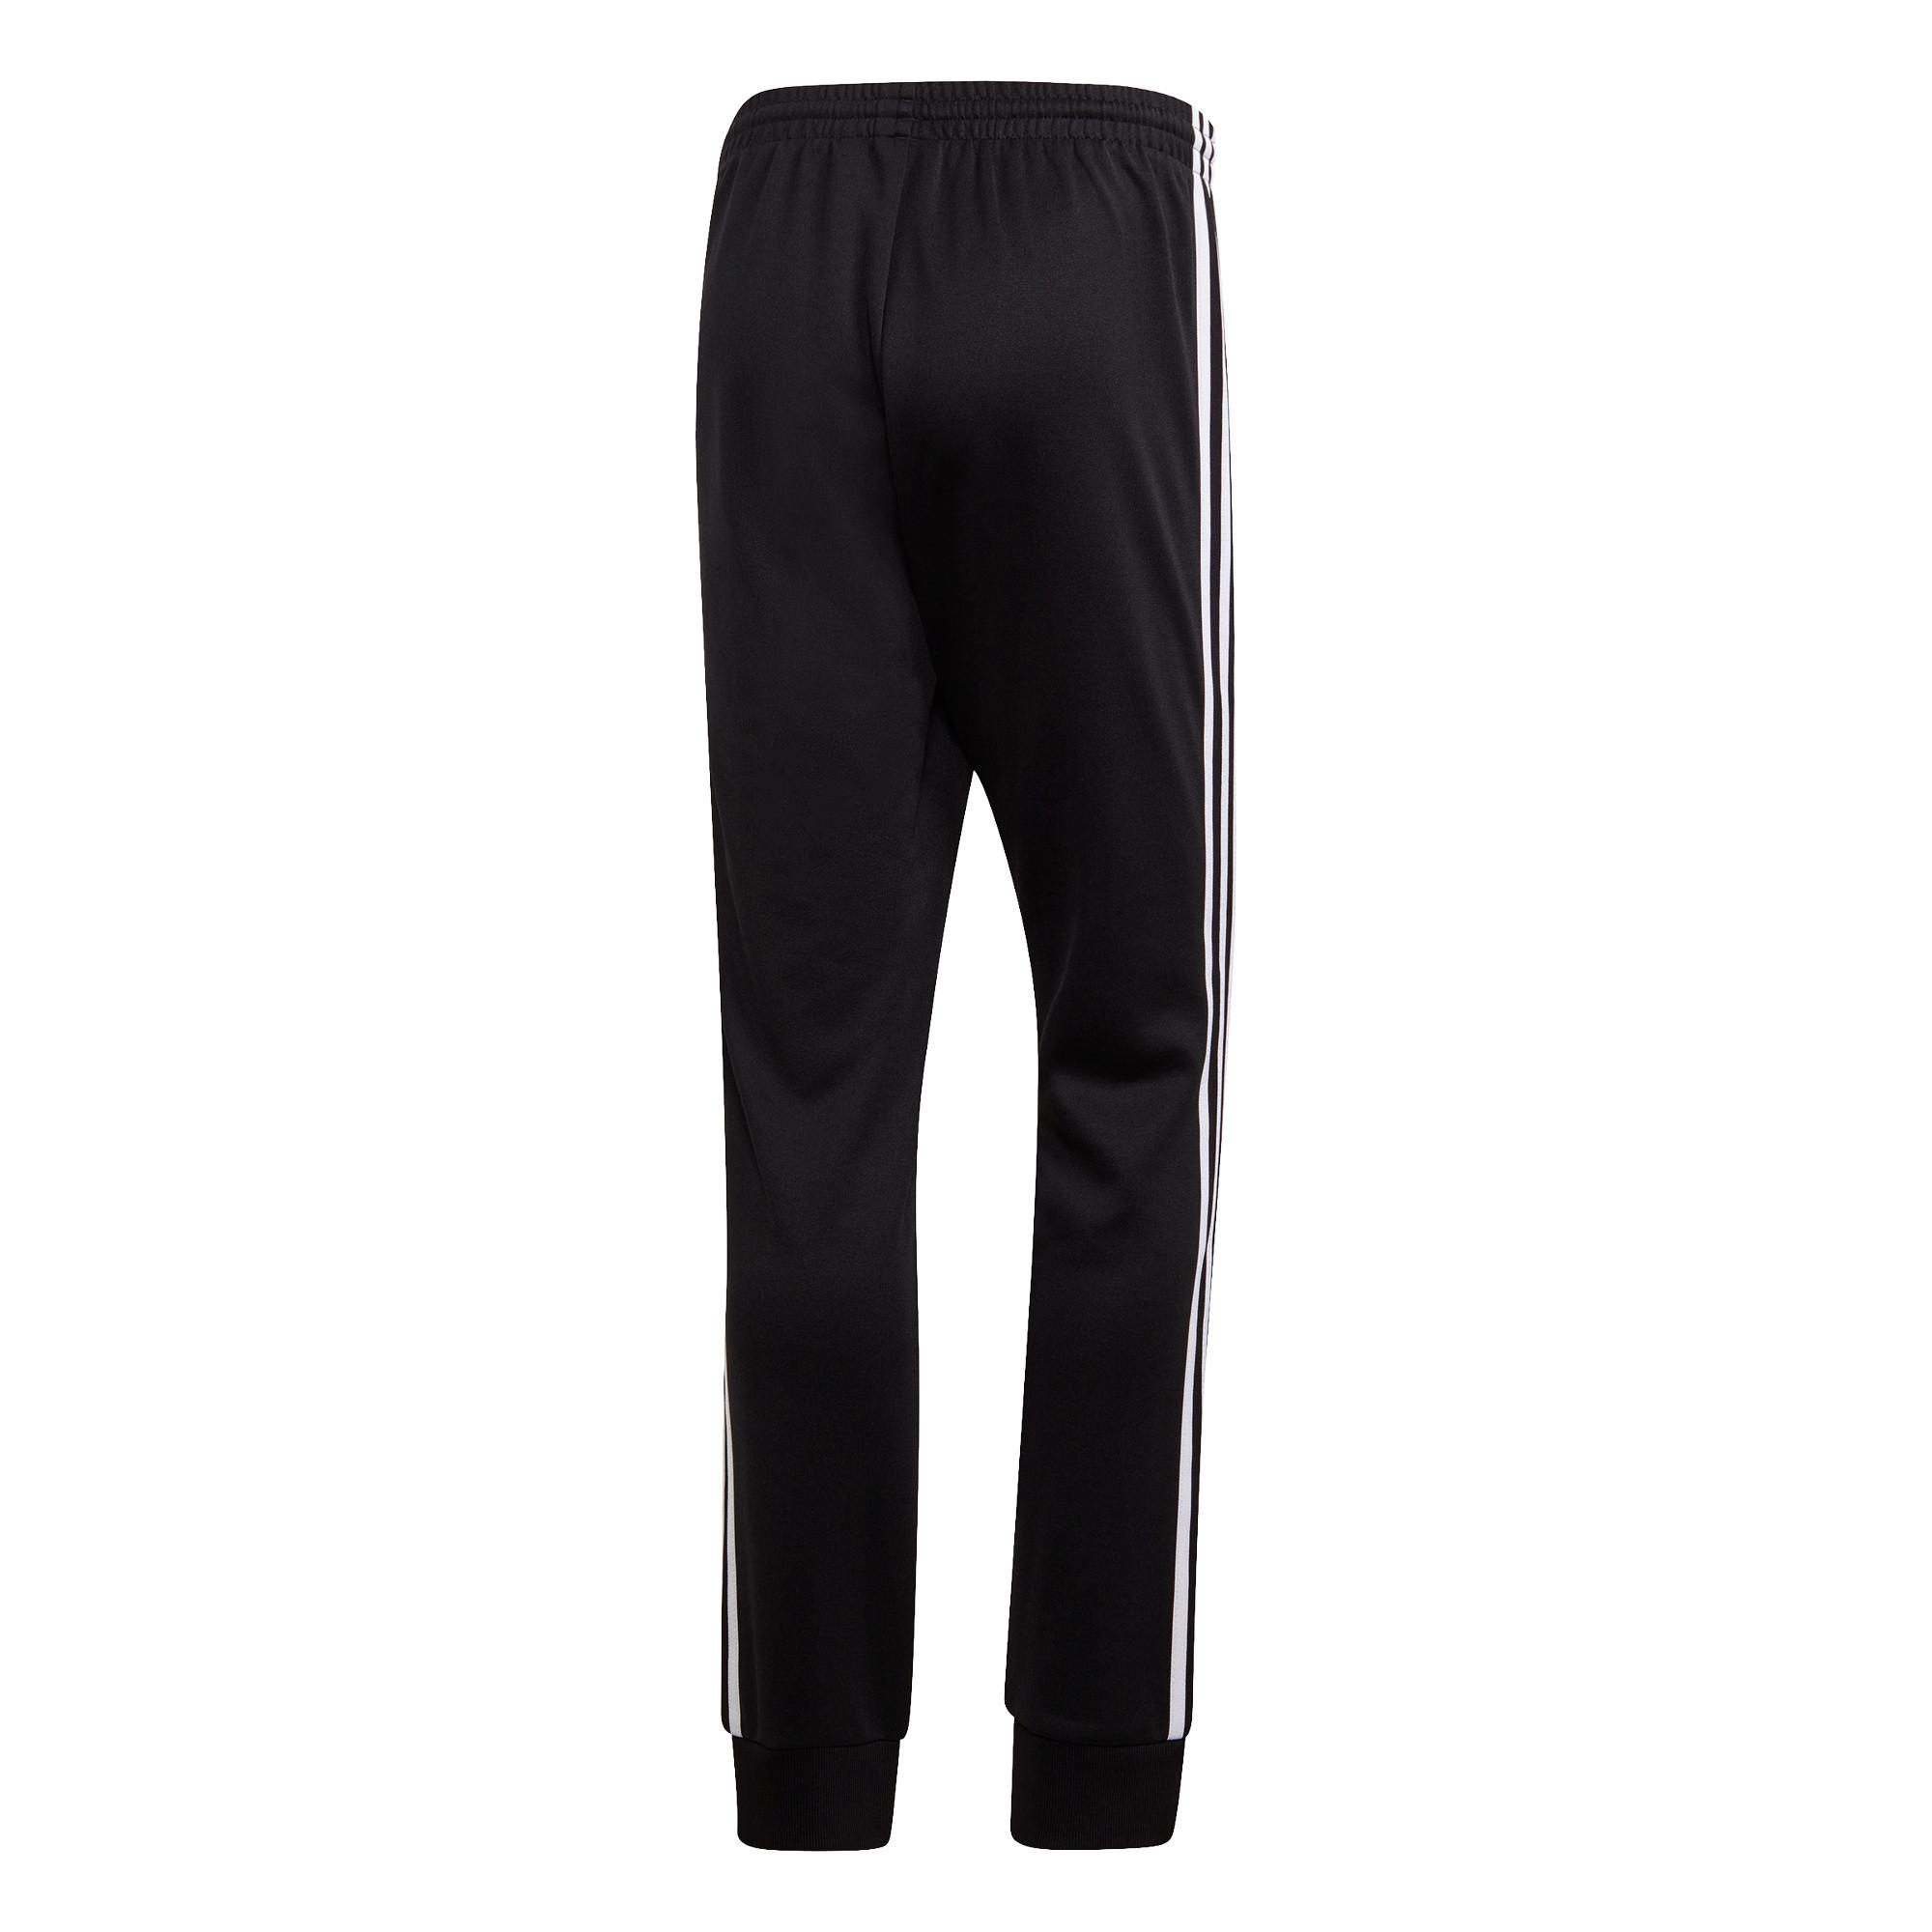 Pantaloni tuta adicolor Classics Primeblue SST, Bianco/Nero, large image number 1